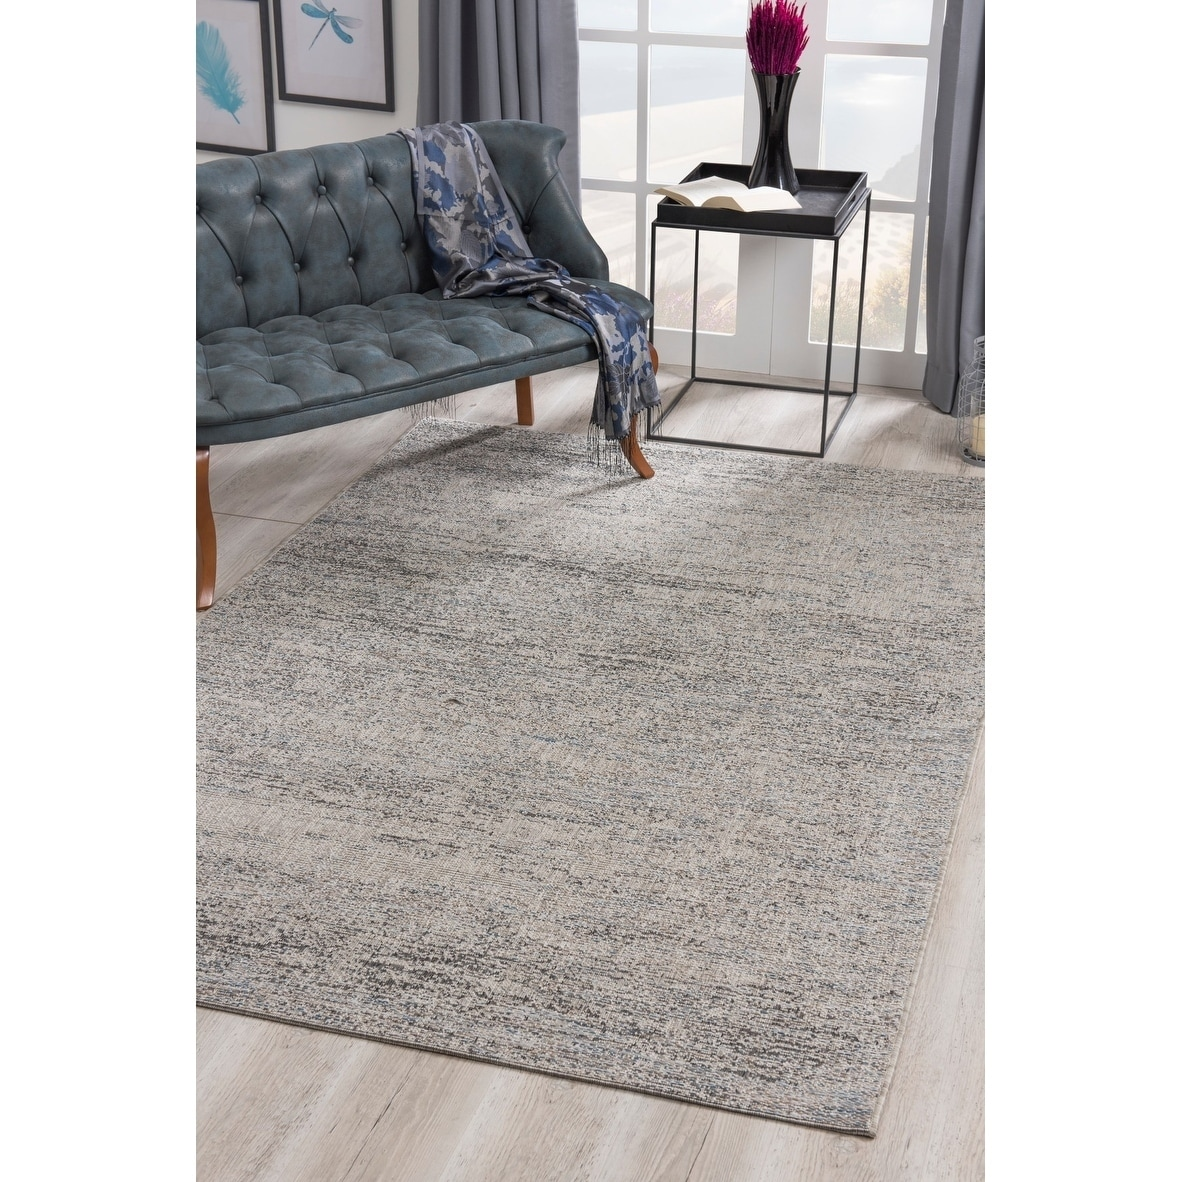 Shop Black Friday Deals On Rug Branch Vista Modern Indoor Outdoor Area Rug And Runner Blue Overstock 29893077